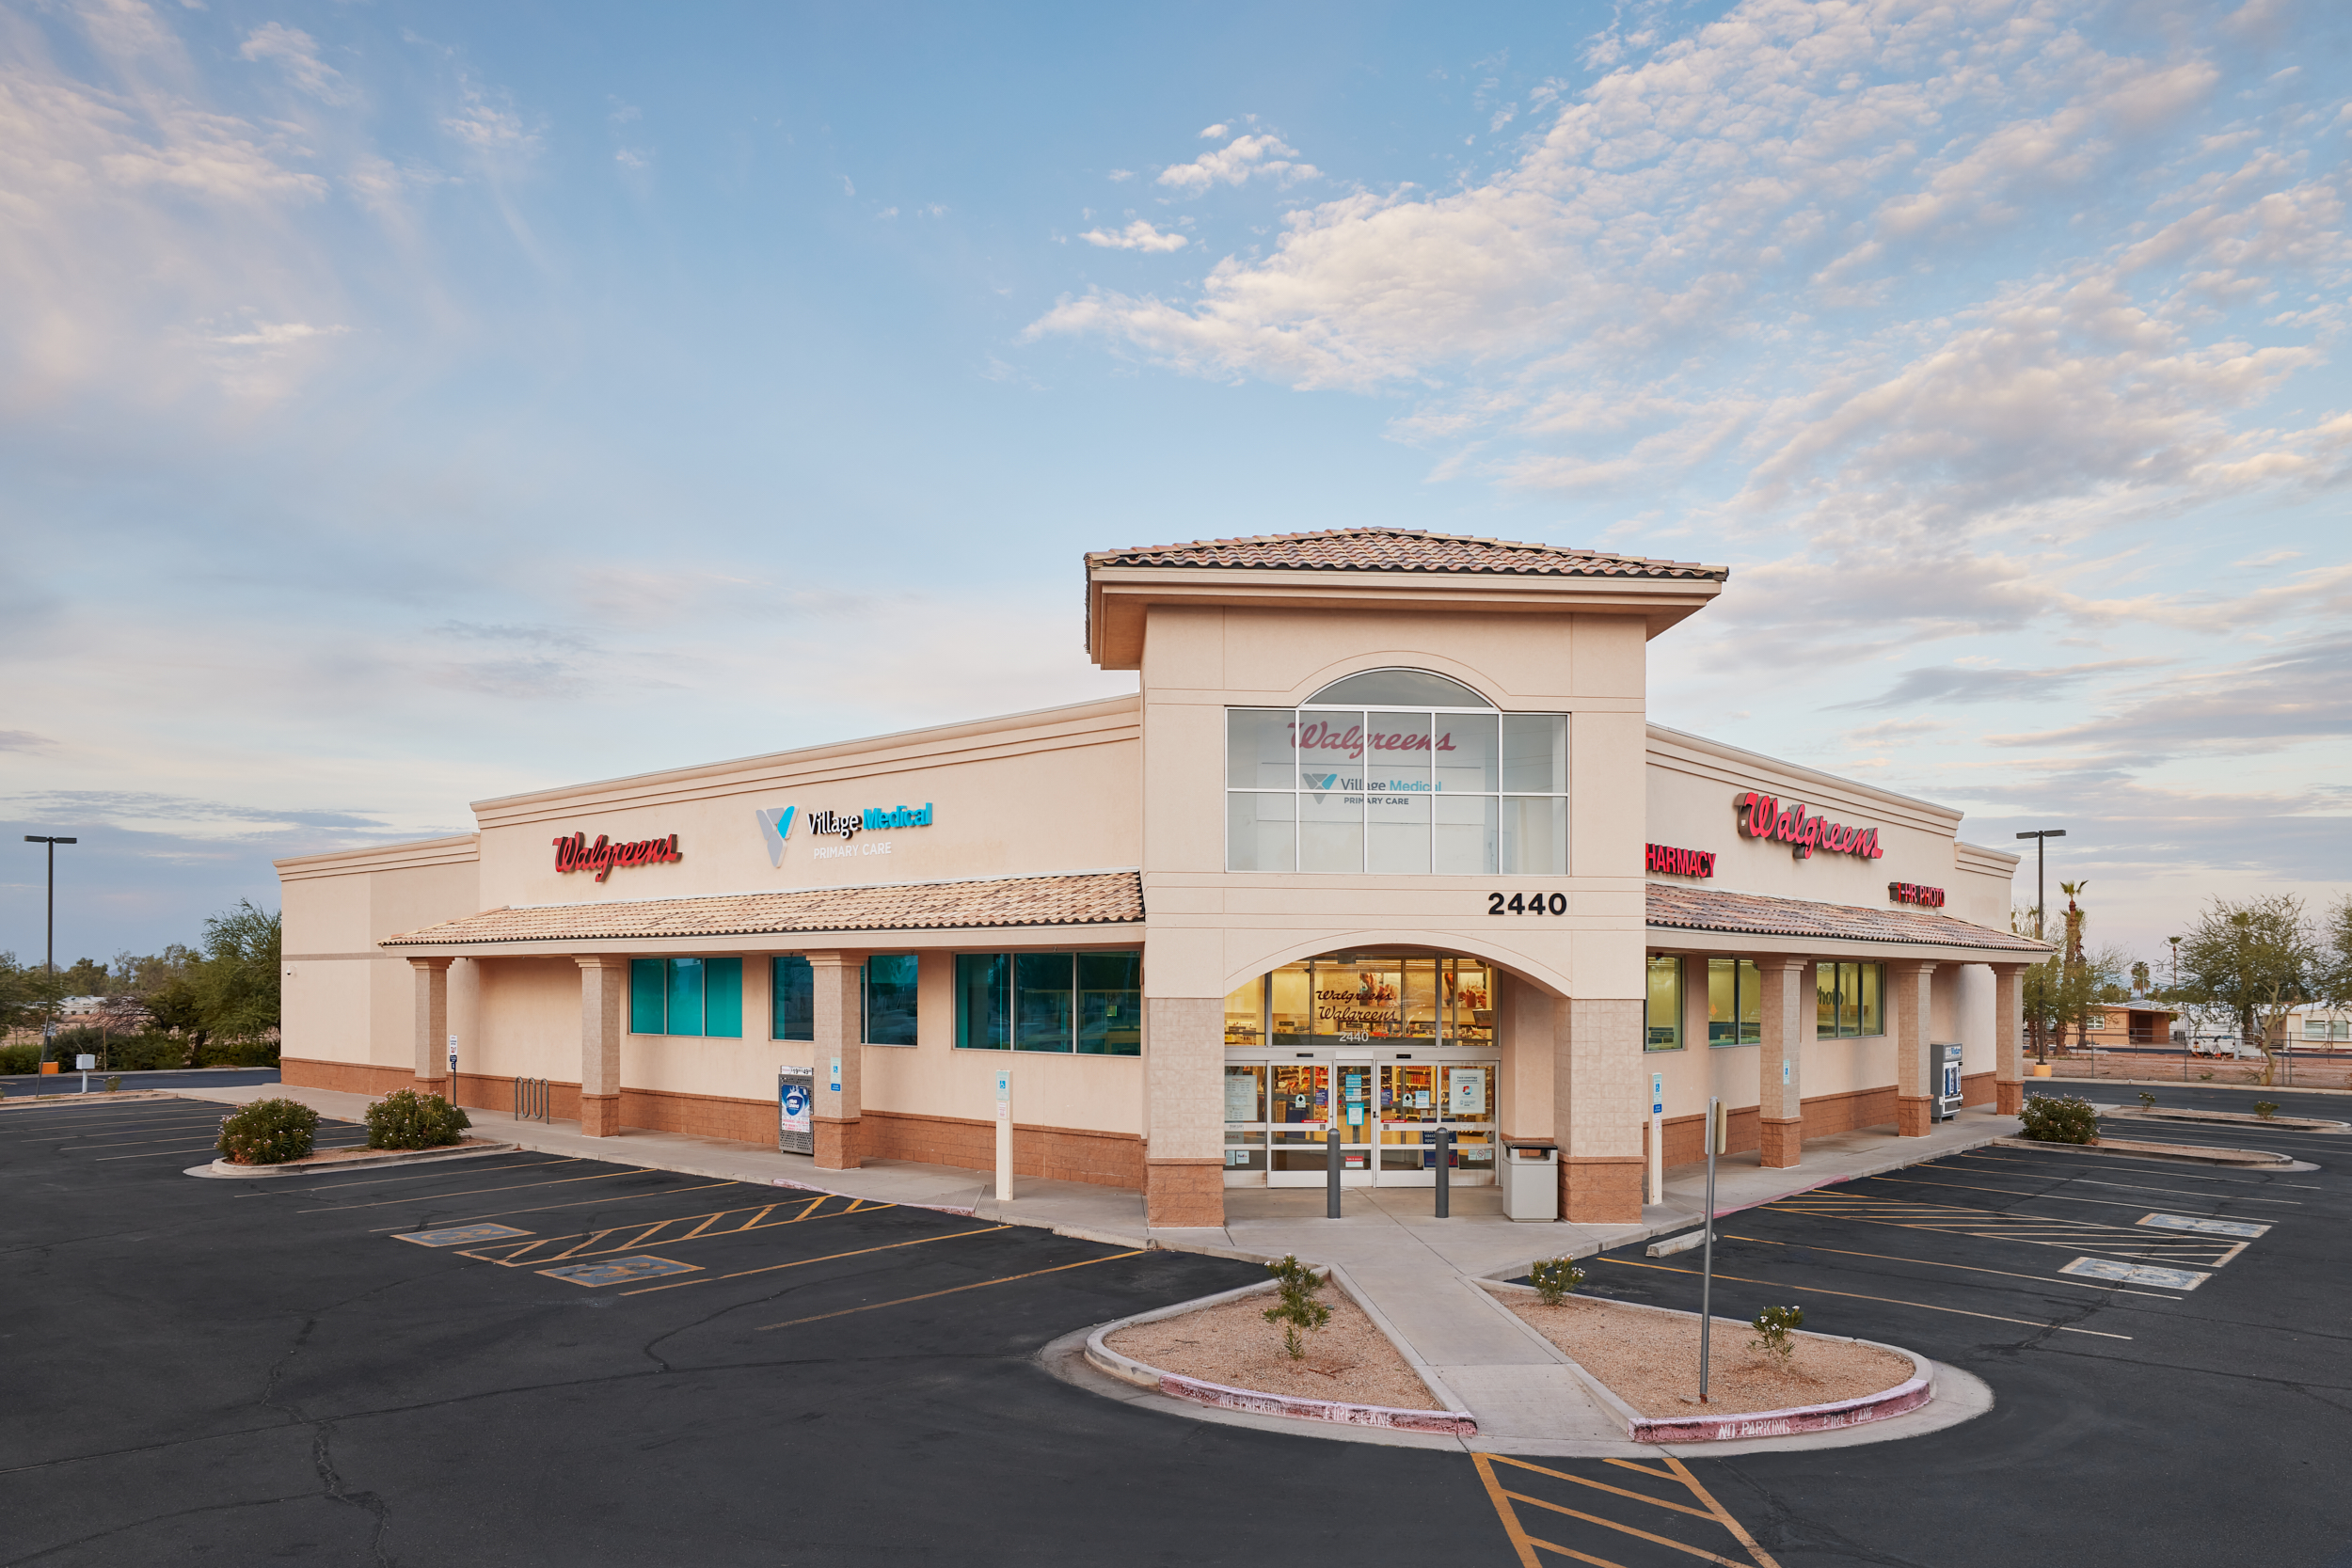 Village Medical at Walgreens - 2440 S. Ironwood Dr. Suite B Apache Junction, AZ 85120